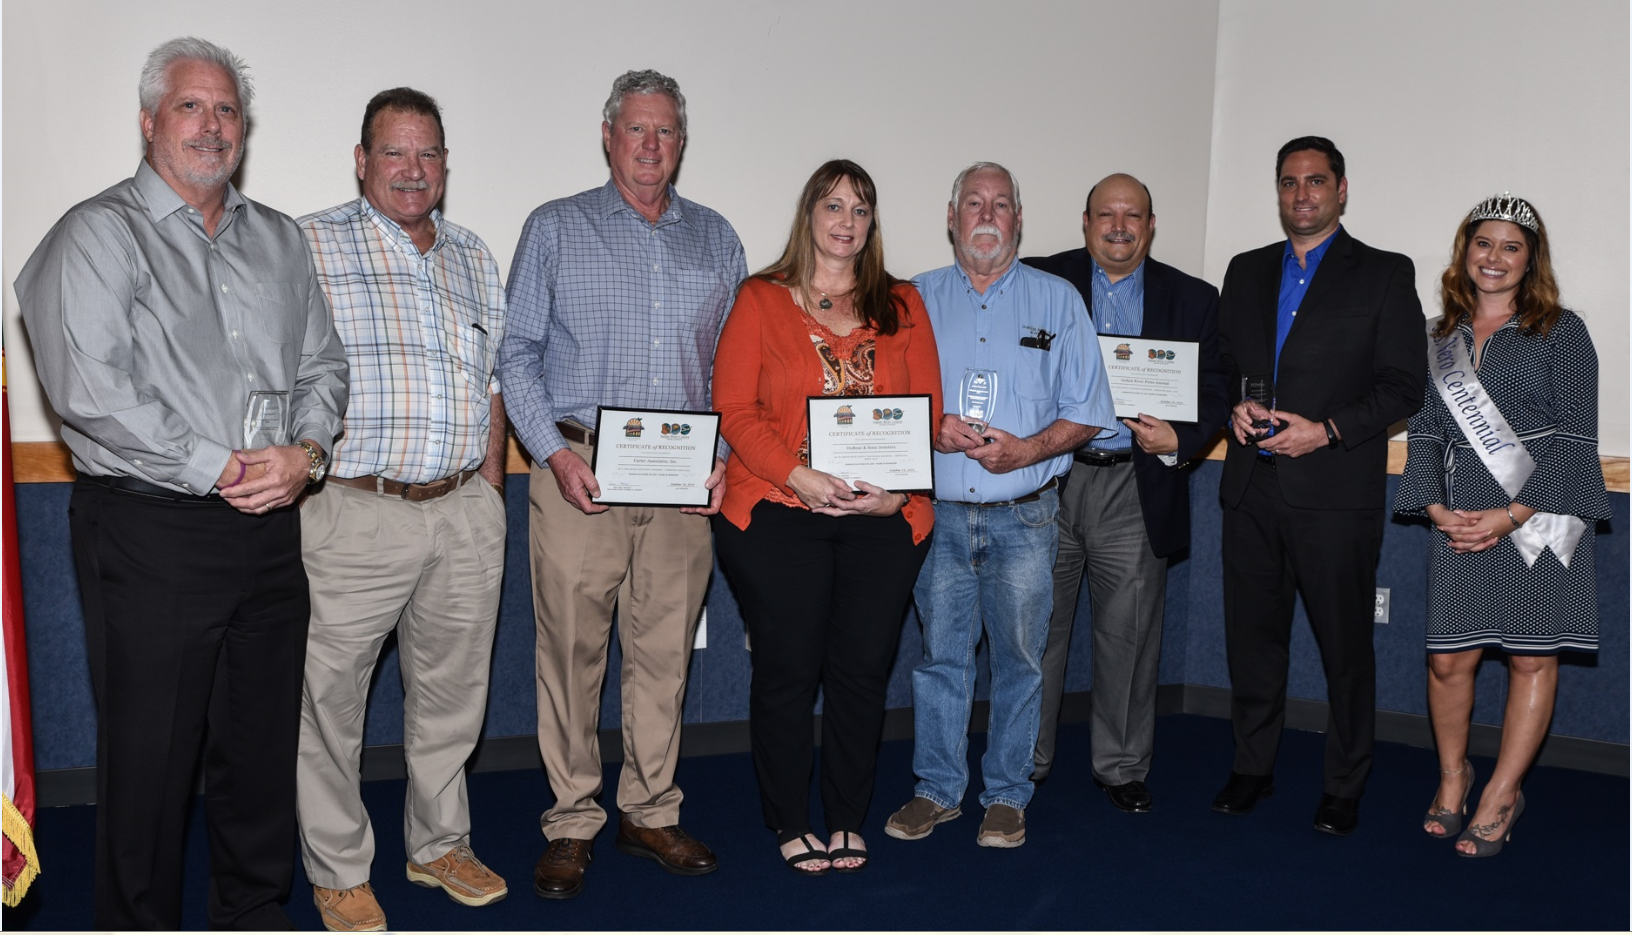 2019 Industry Appreciation & Awards Luncheon